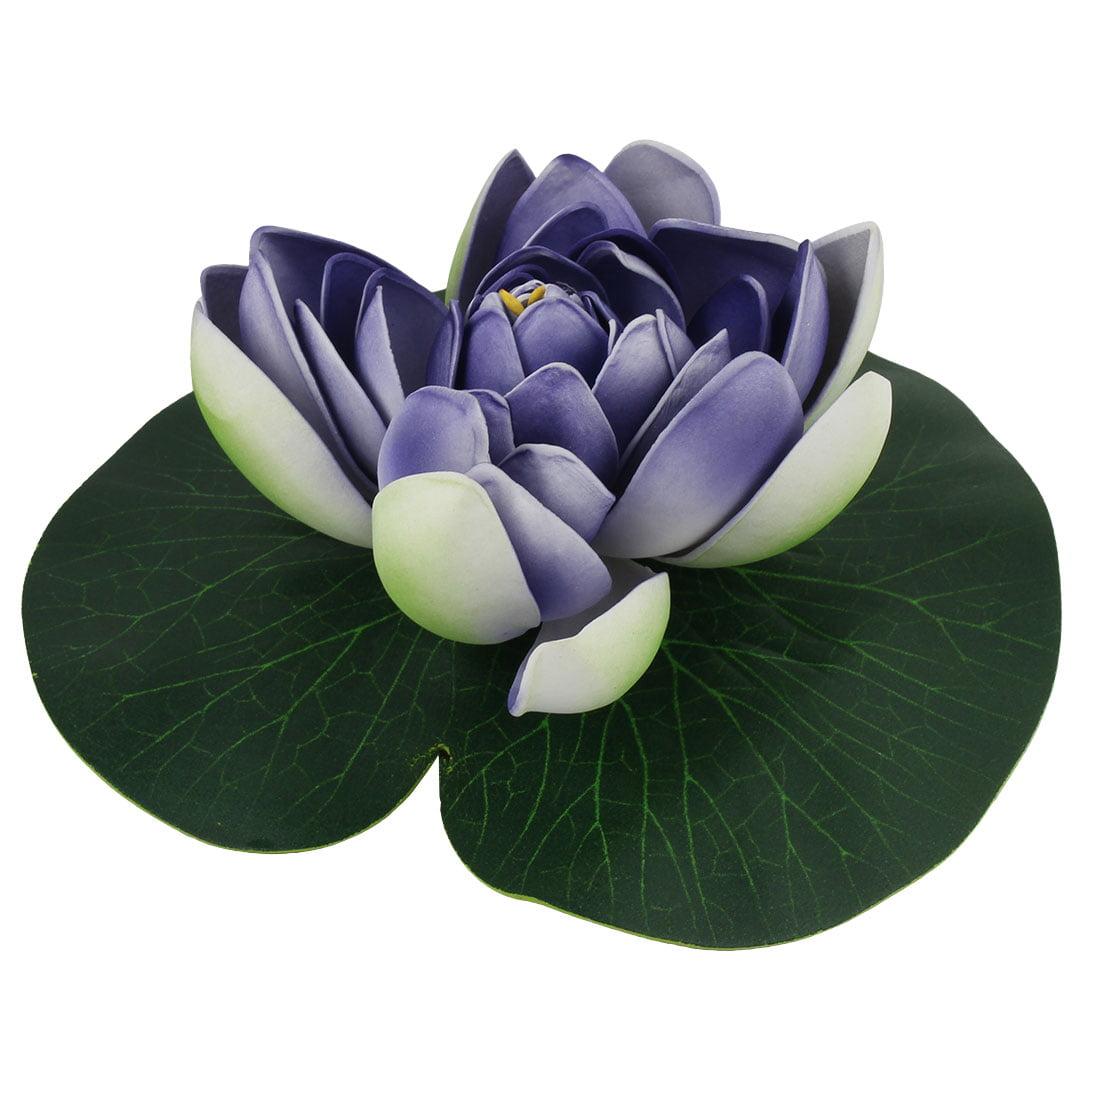 Aquarium Fish Tank Artificial Floating Lotus Flower Leaf Ornament